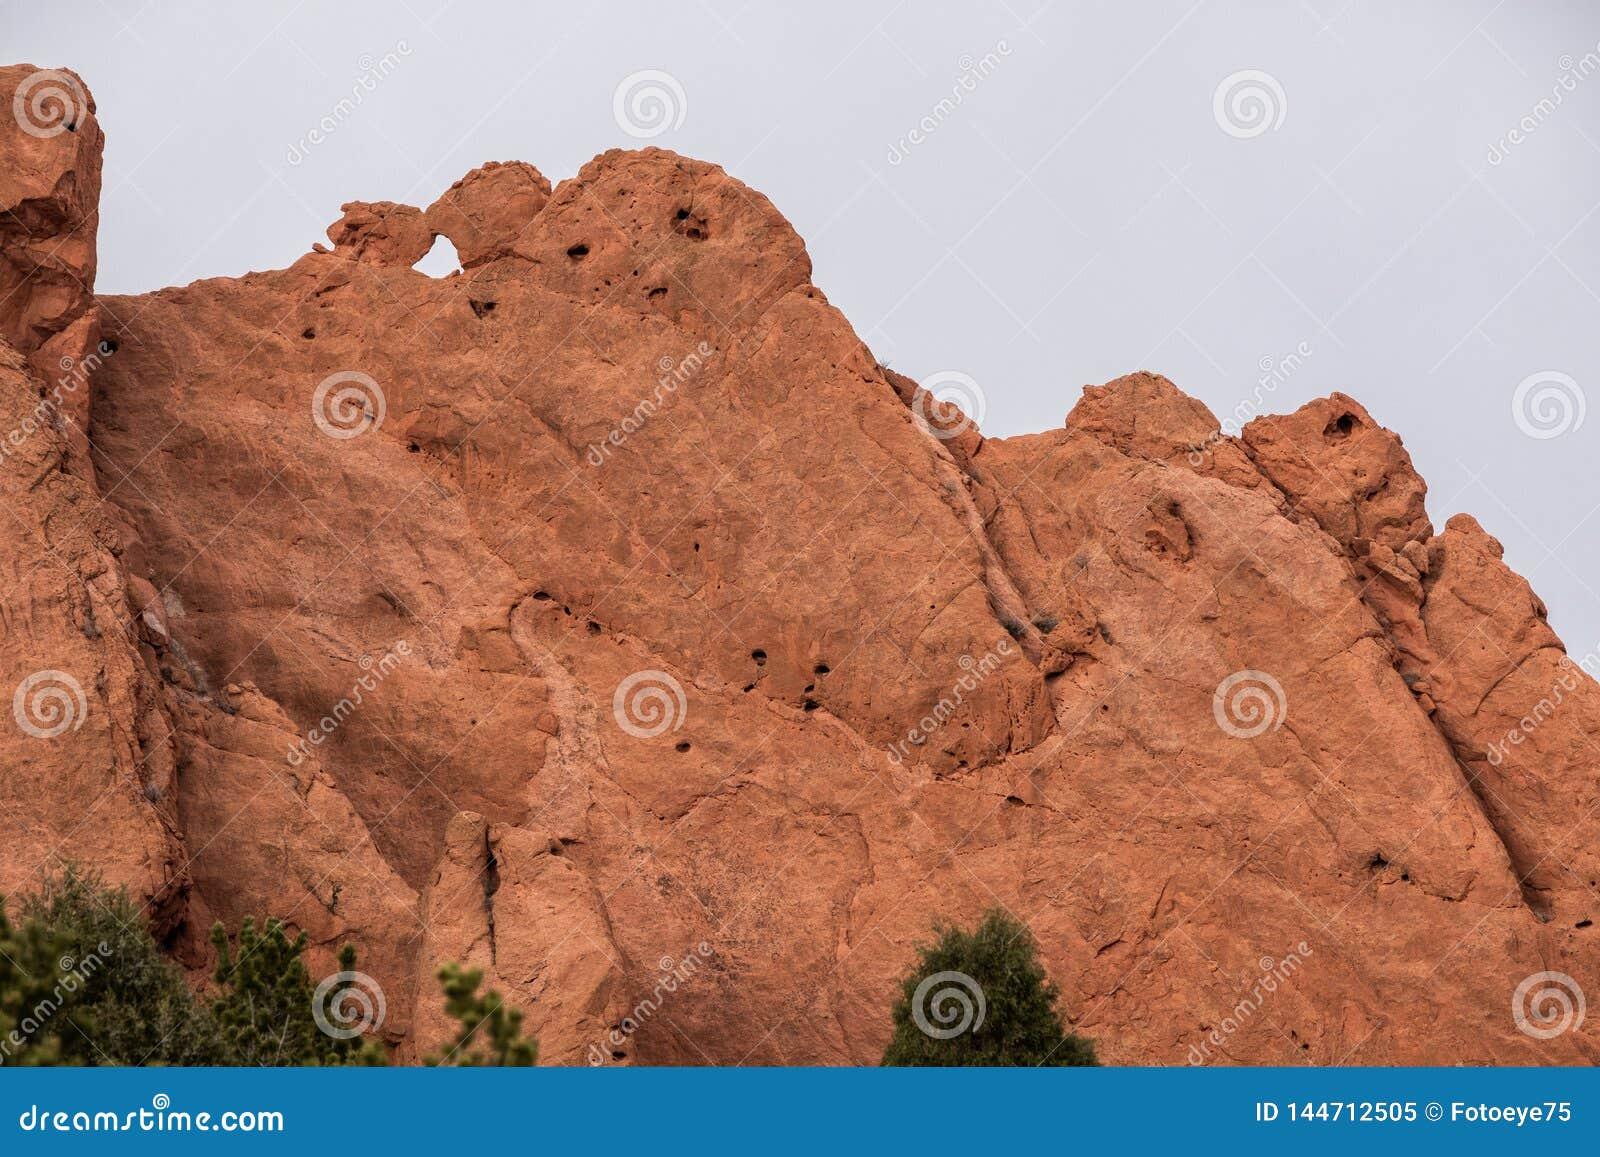 Kissing Camels Colorado Springs Garden Of The Gods Rocky